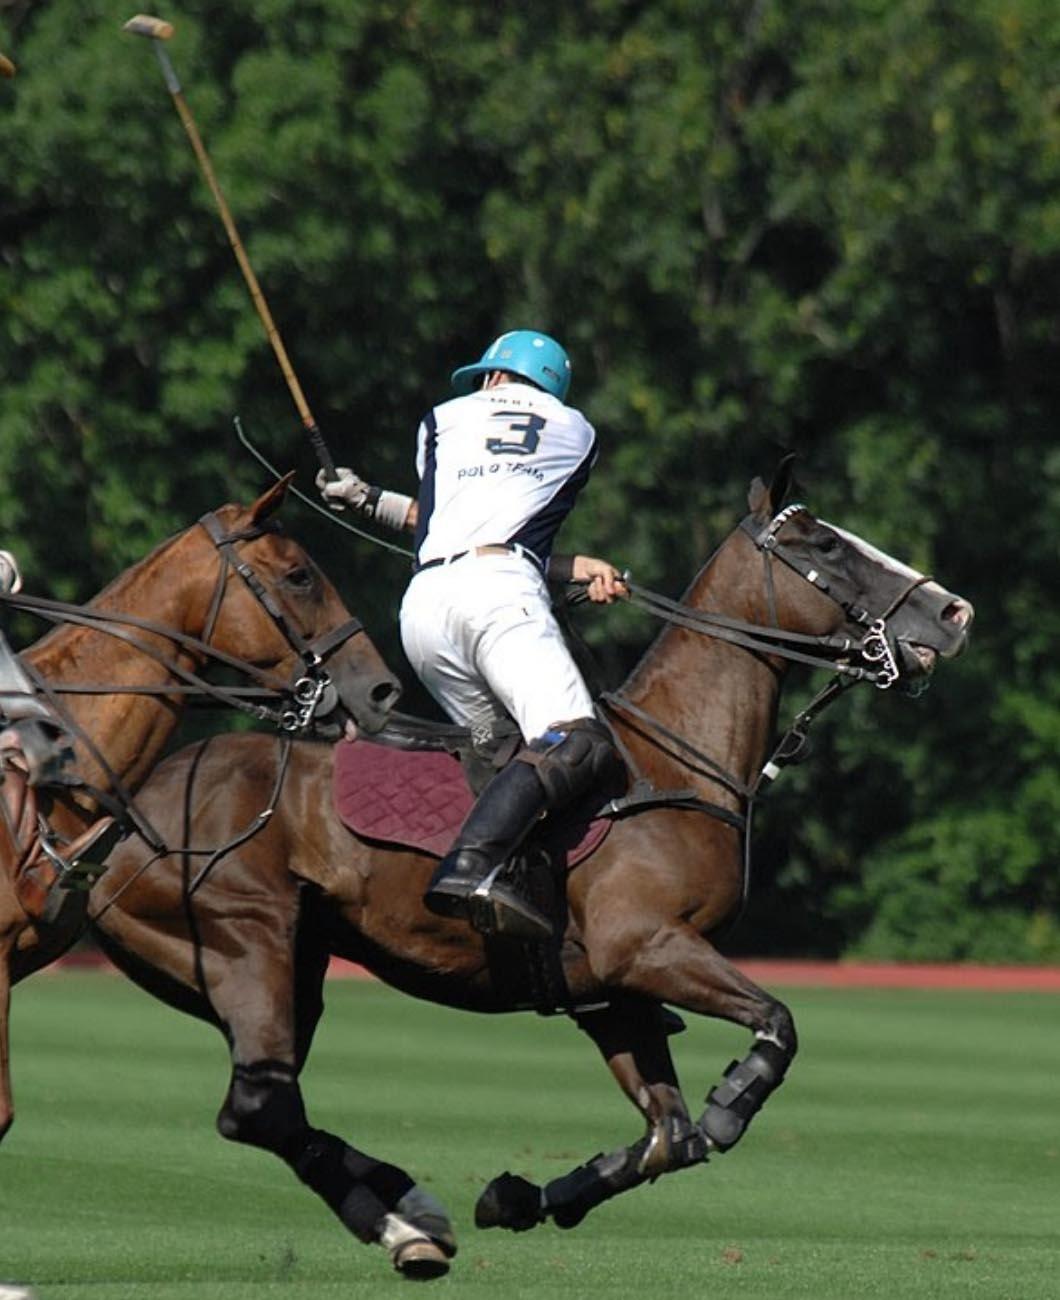 polo_men_player_horses_societal_gender_norms